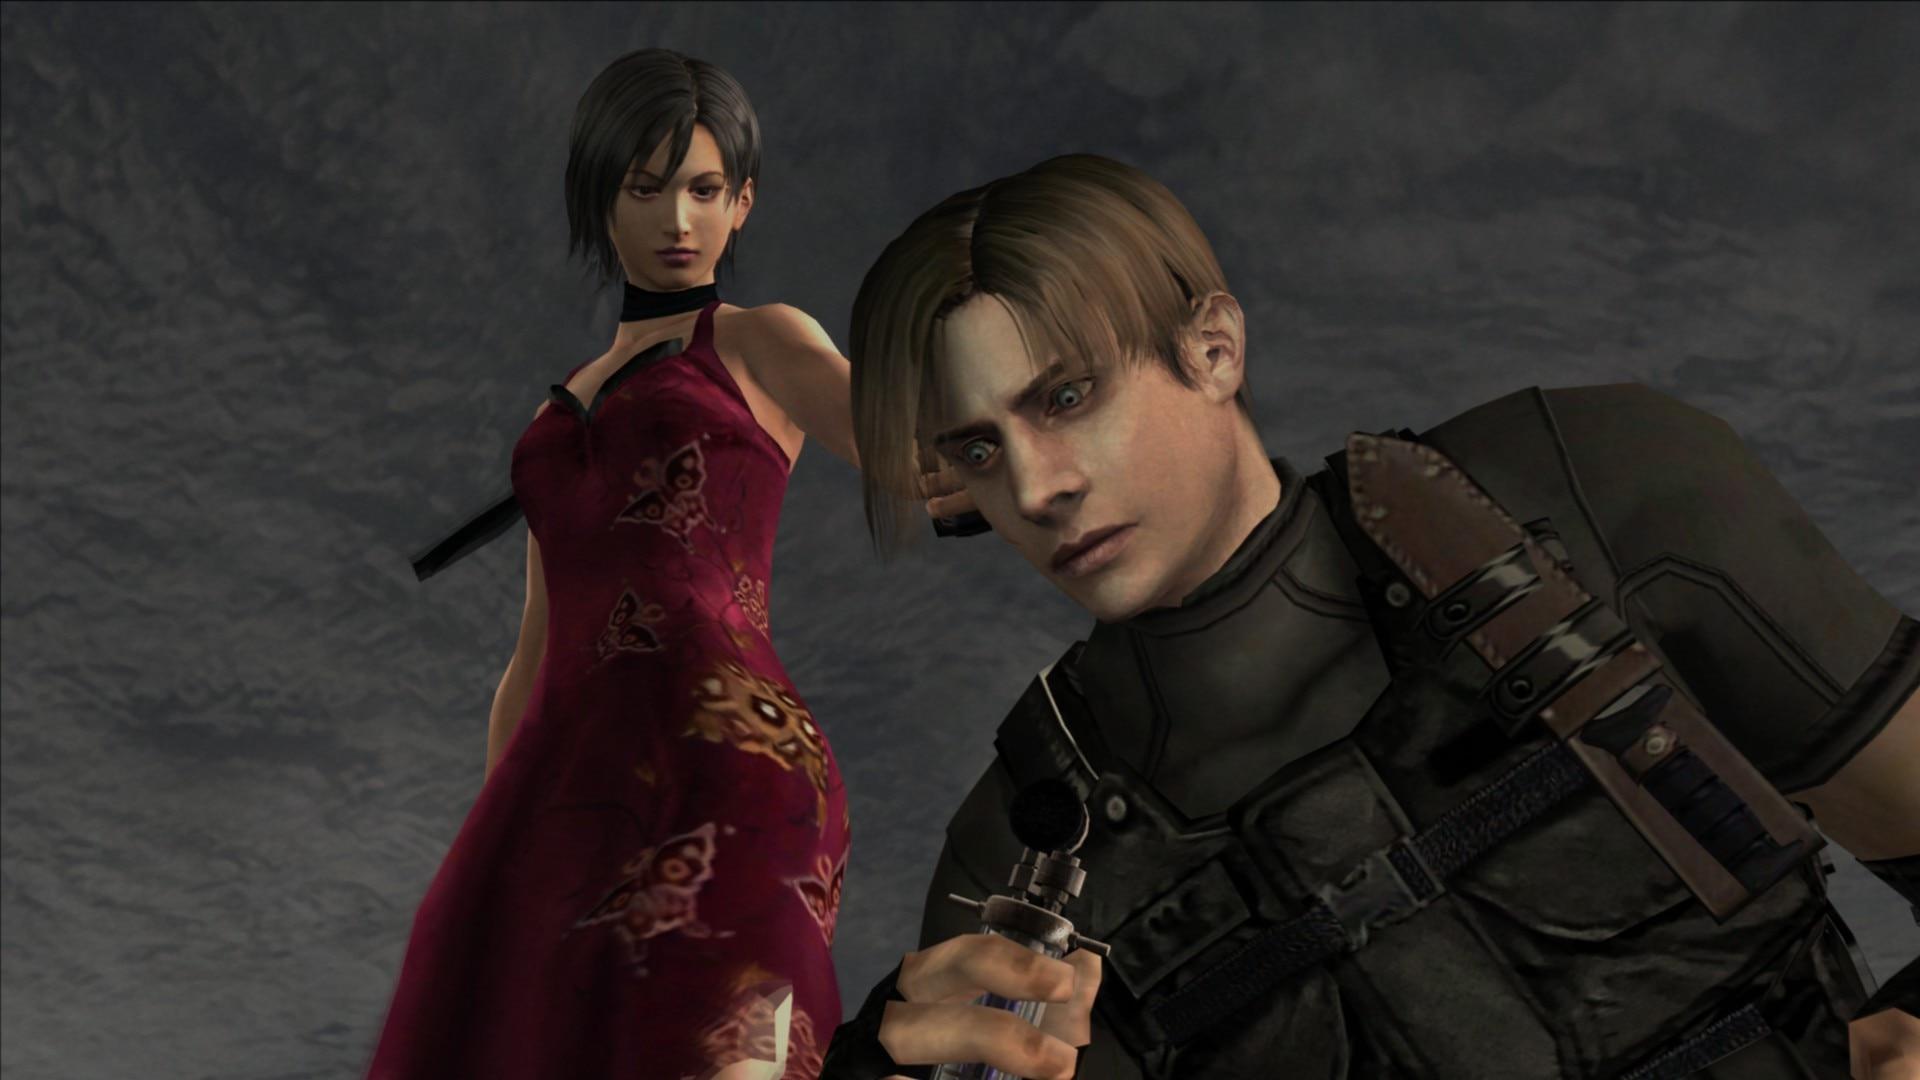 Sally Cahill and Paul Mercier in Biohazard 4 (2005)